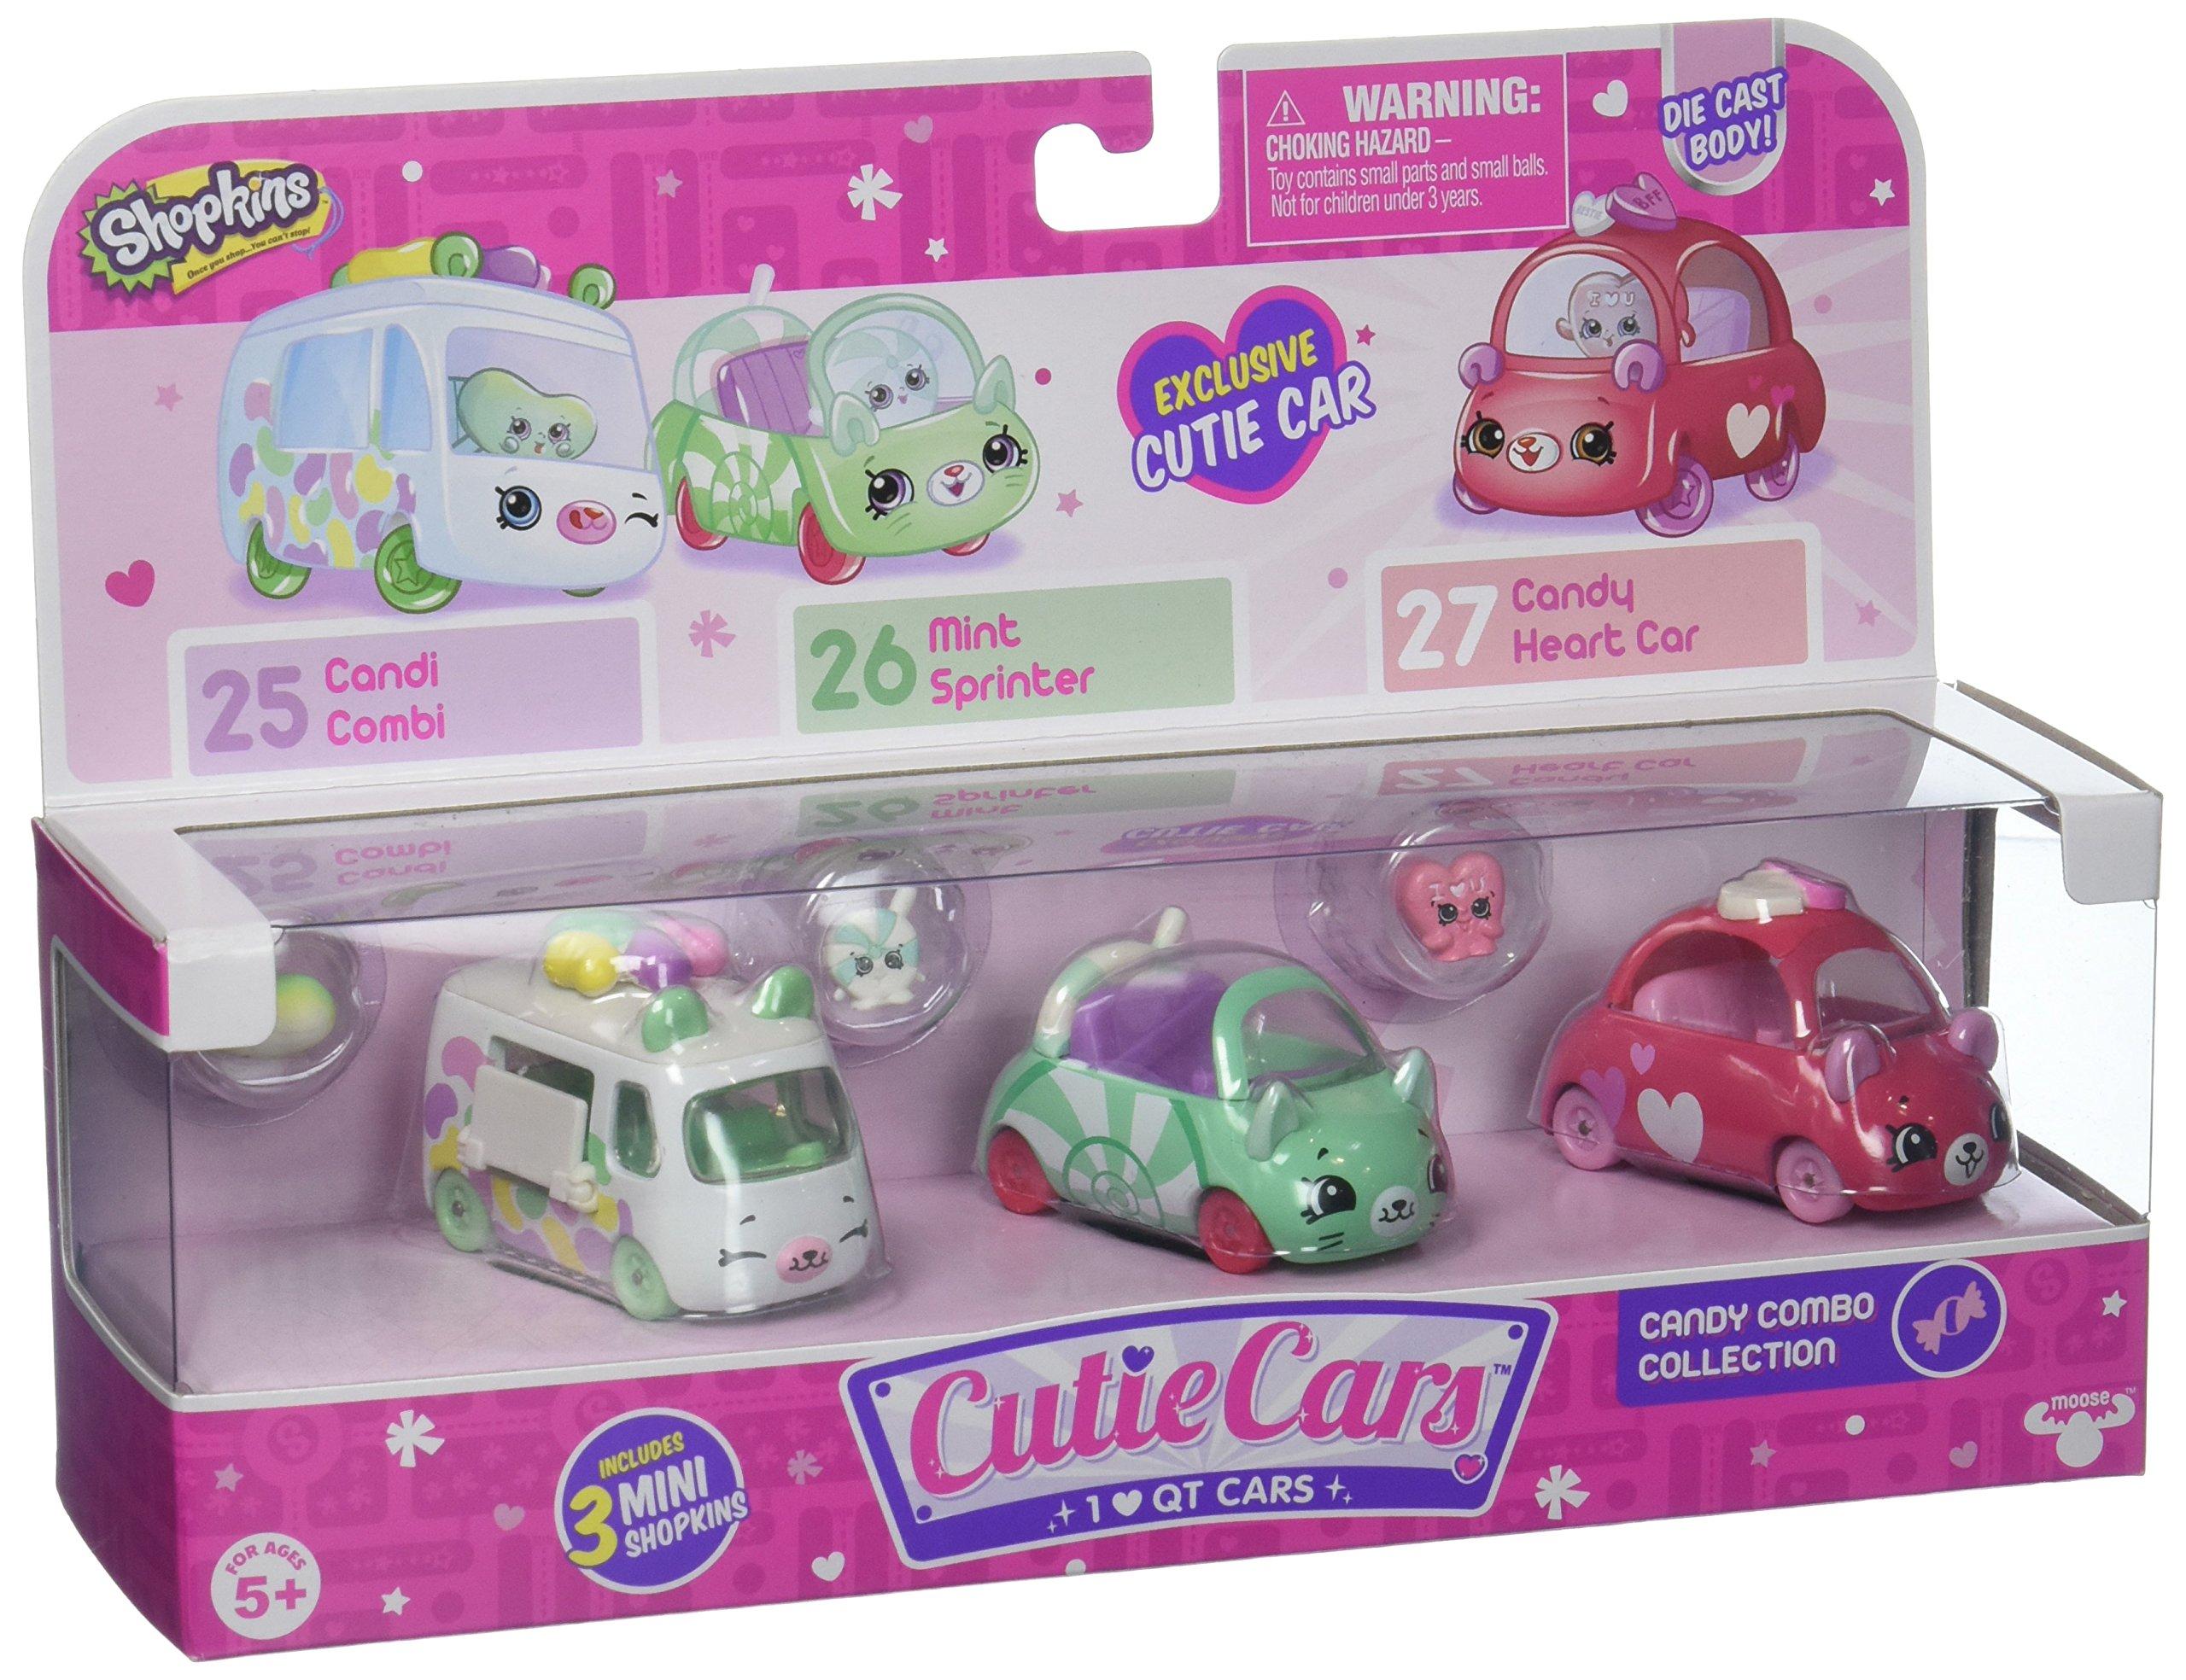 Cutie Car Spk Season 1 Candy Combo 3 Pack